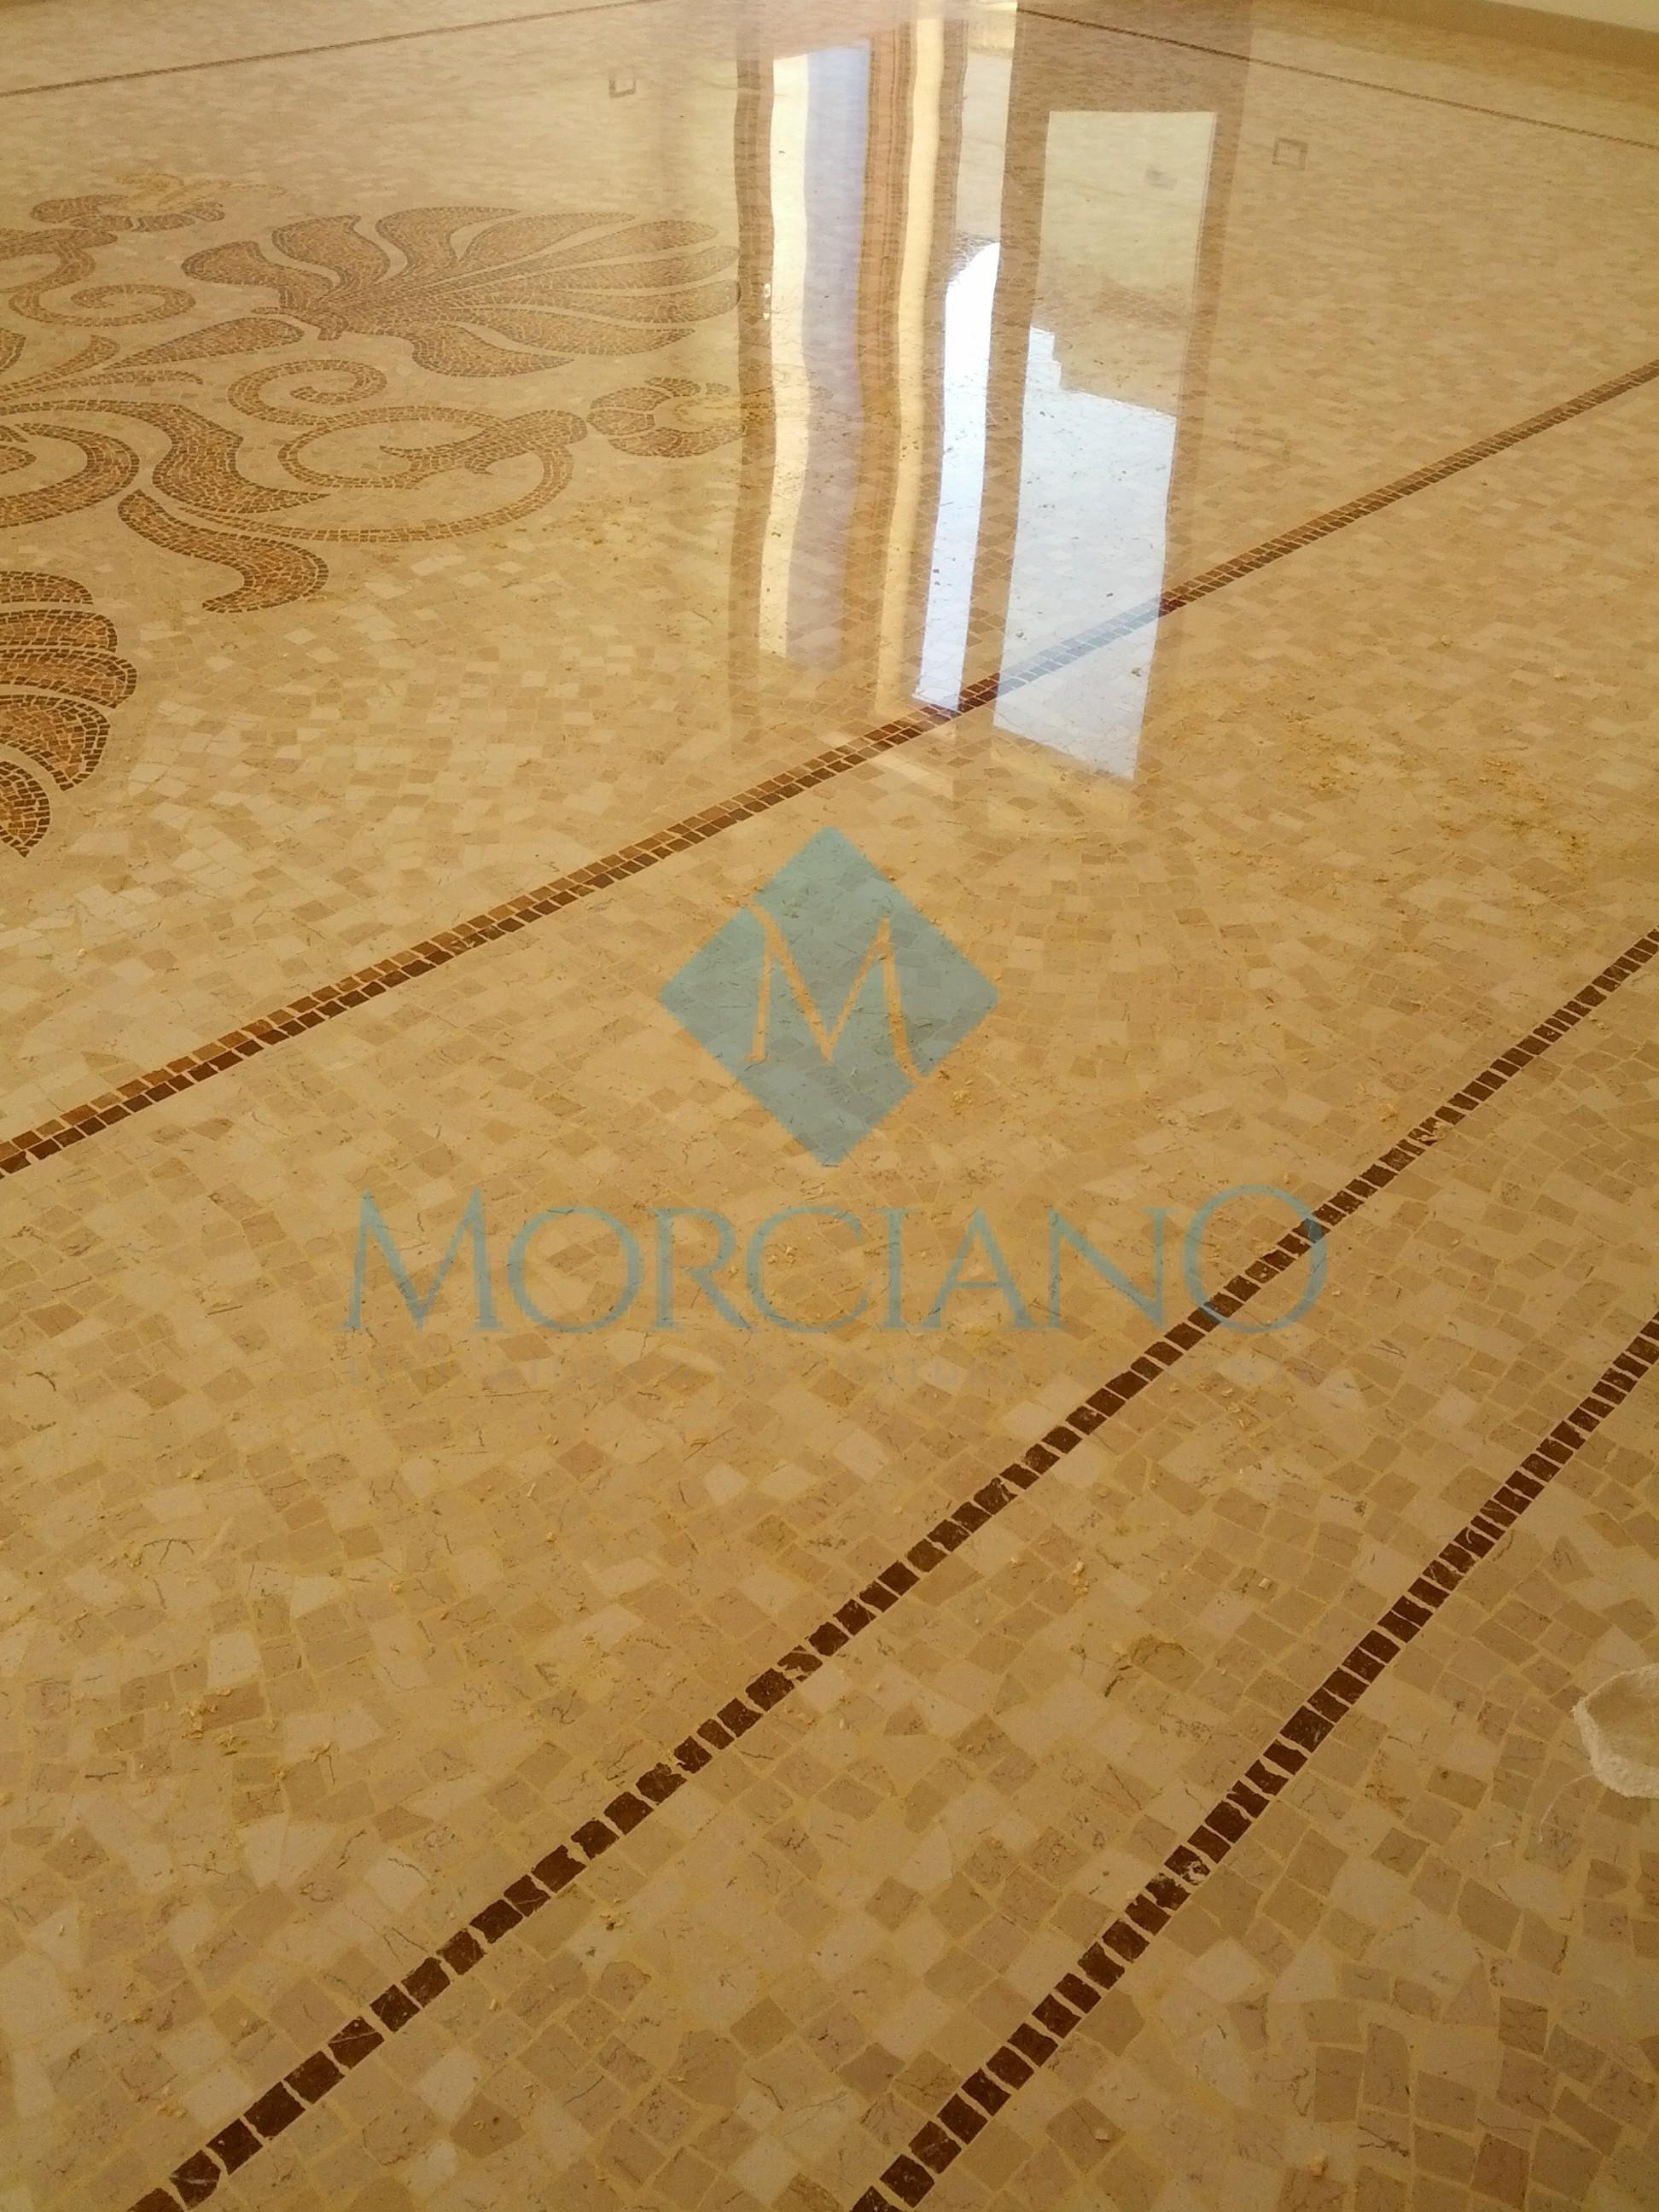 Levigatura e lucidatura di un pavimento a mosaico a lecce for Mosaico pavimento